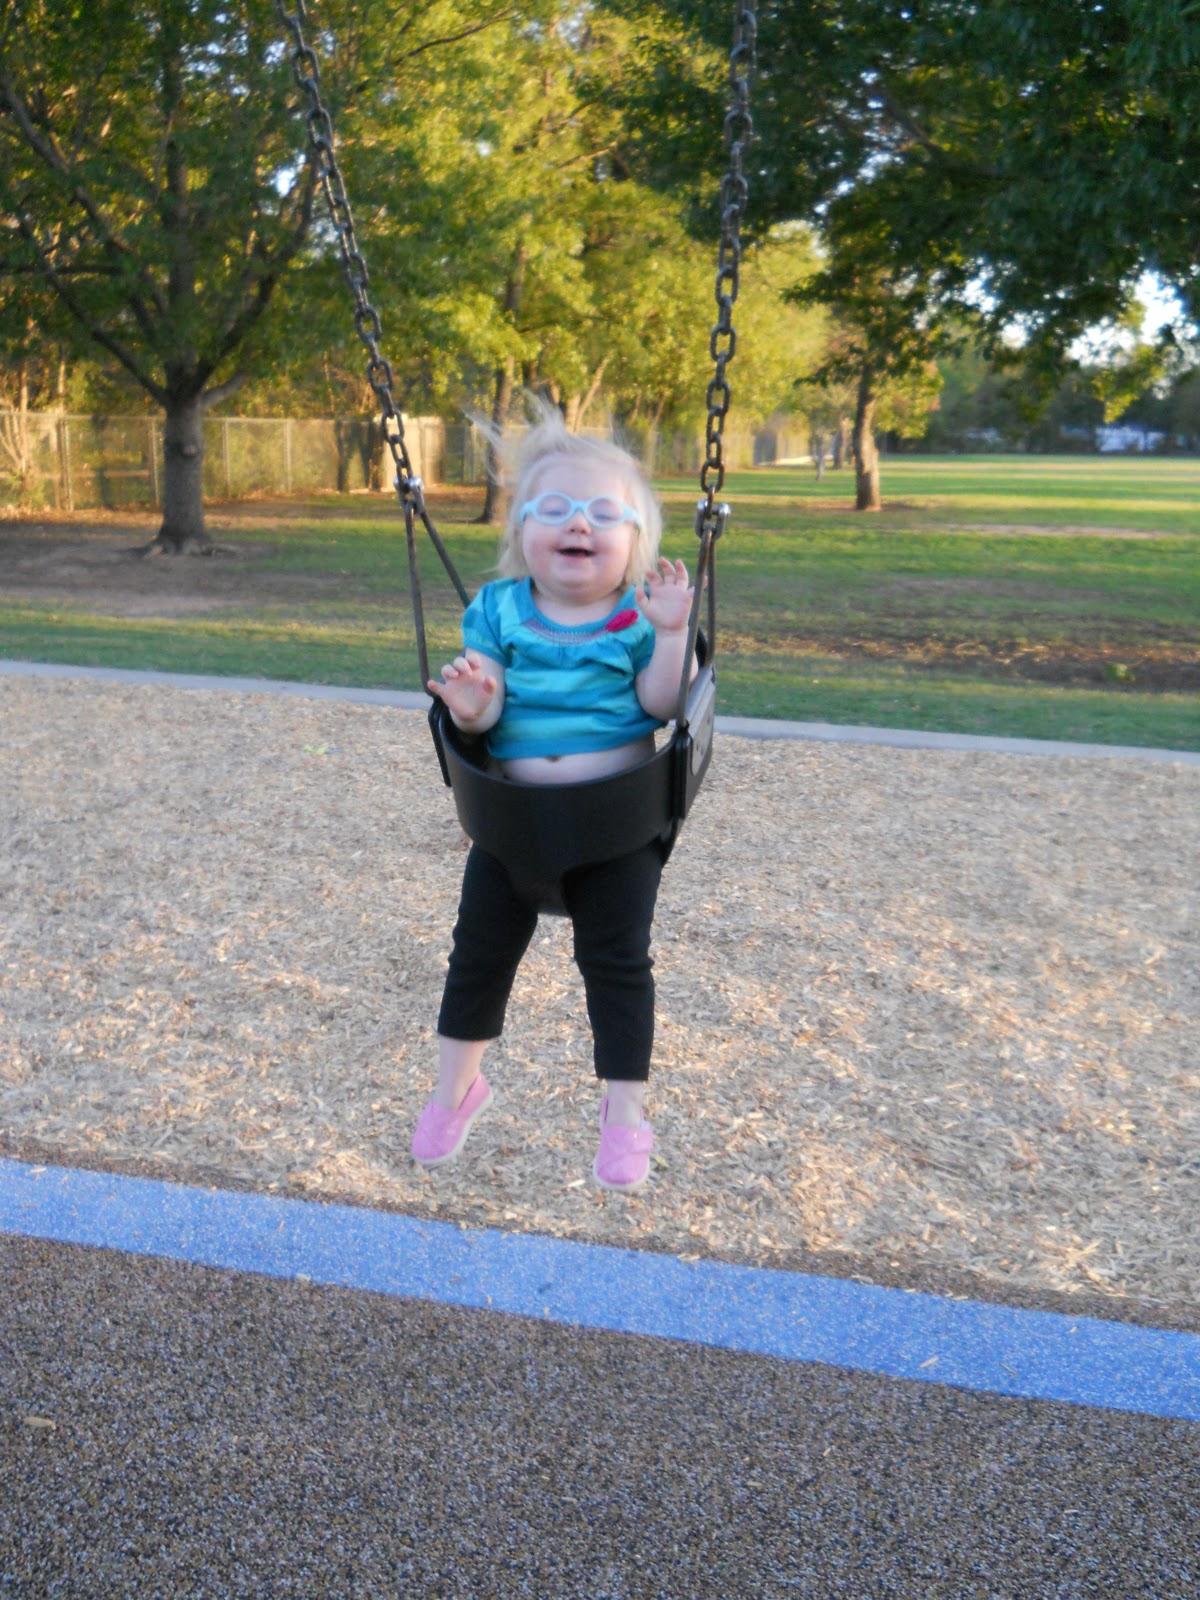 Rayleigh Bug Blog: October 2011